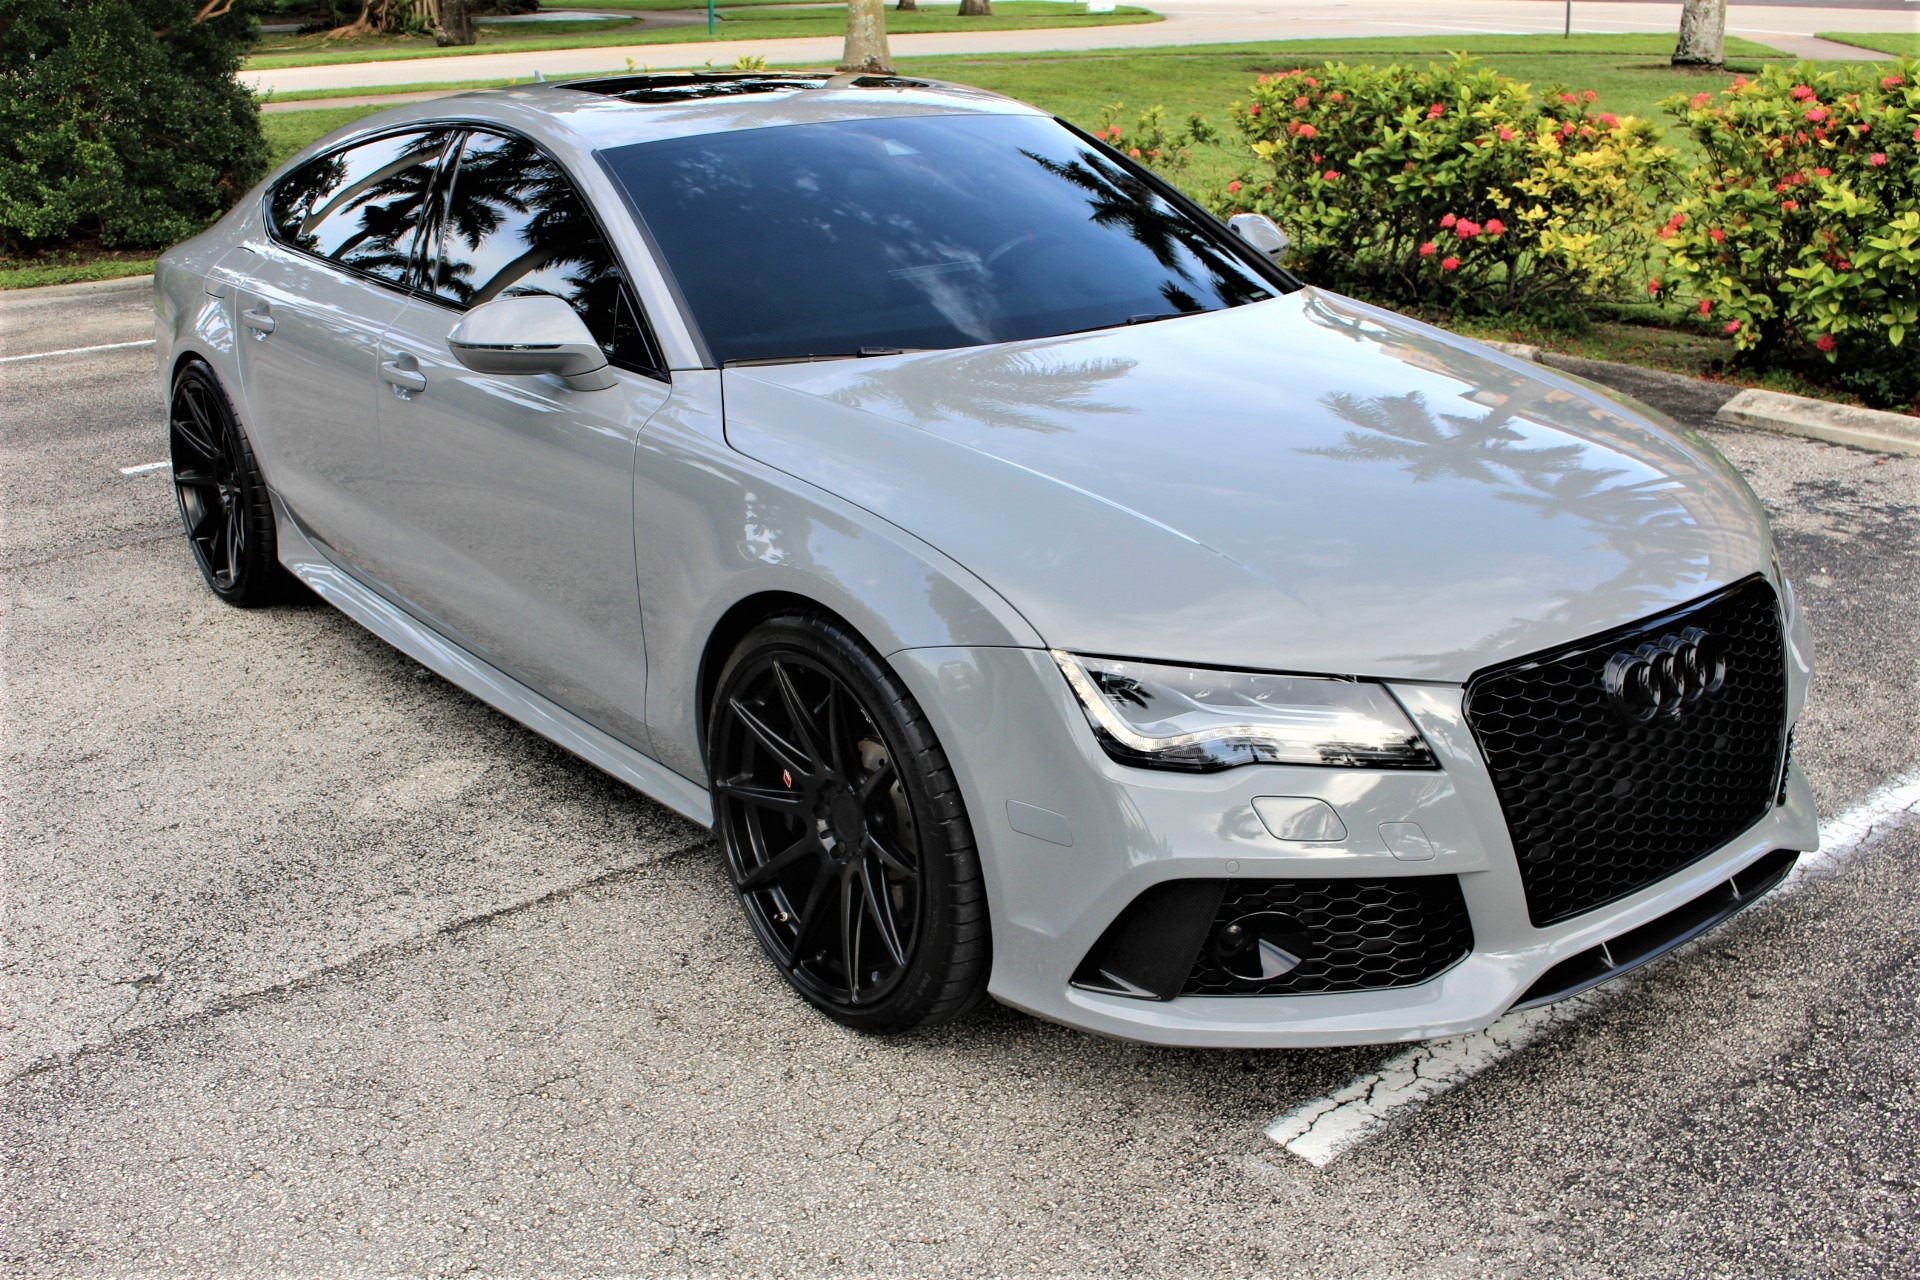 Used 2015 Audi RS 7 4.0T quattro Prestige for sale Sold at The Gables Sports Cars in Miami FL 33146 2